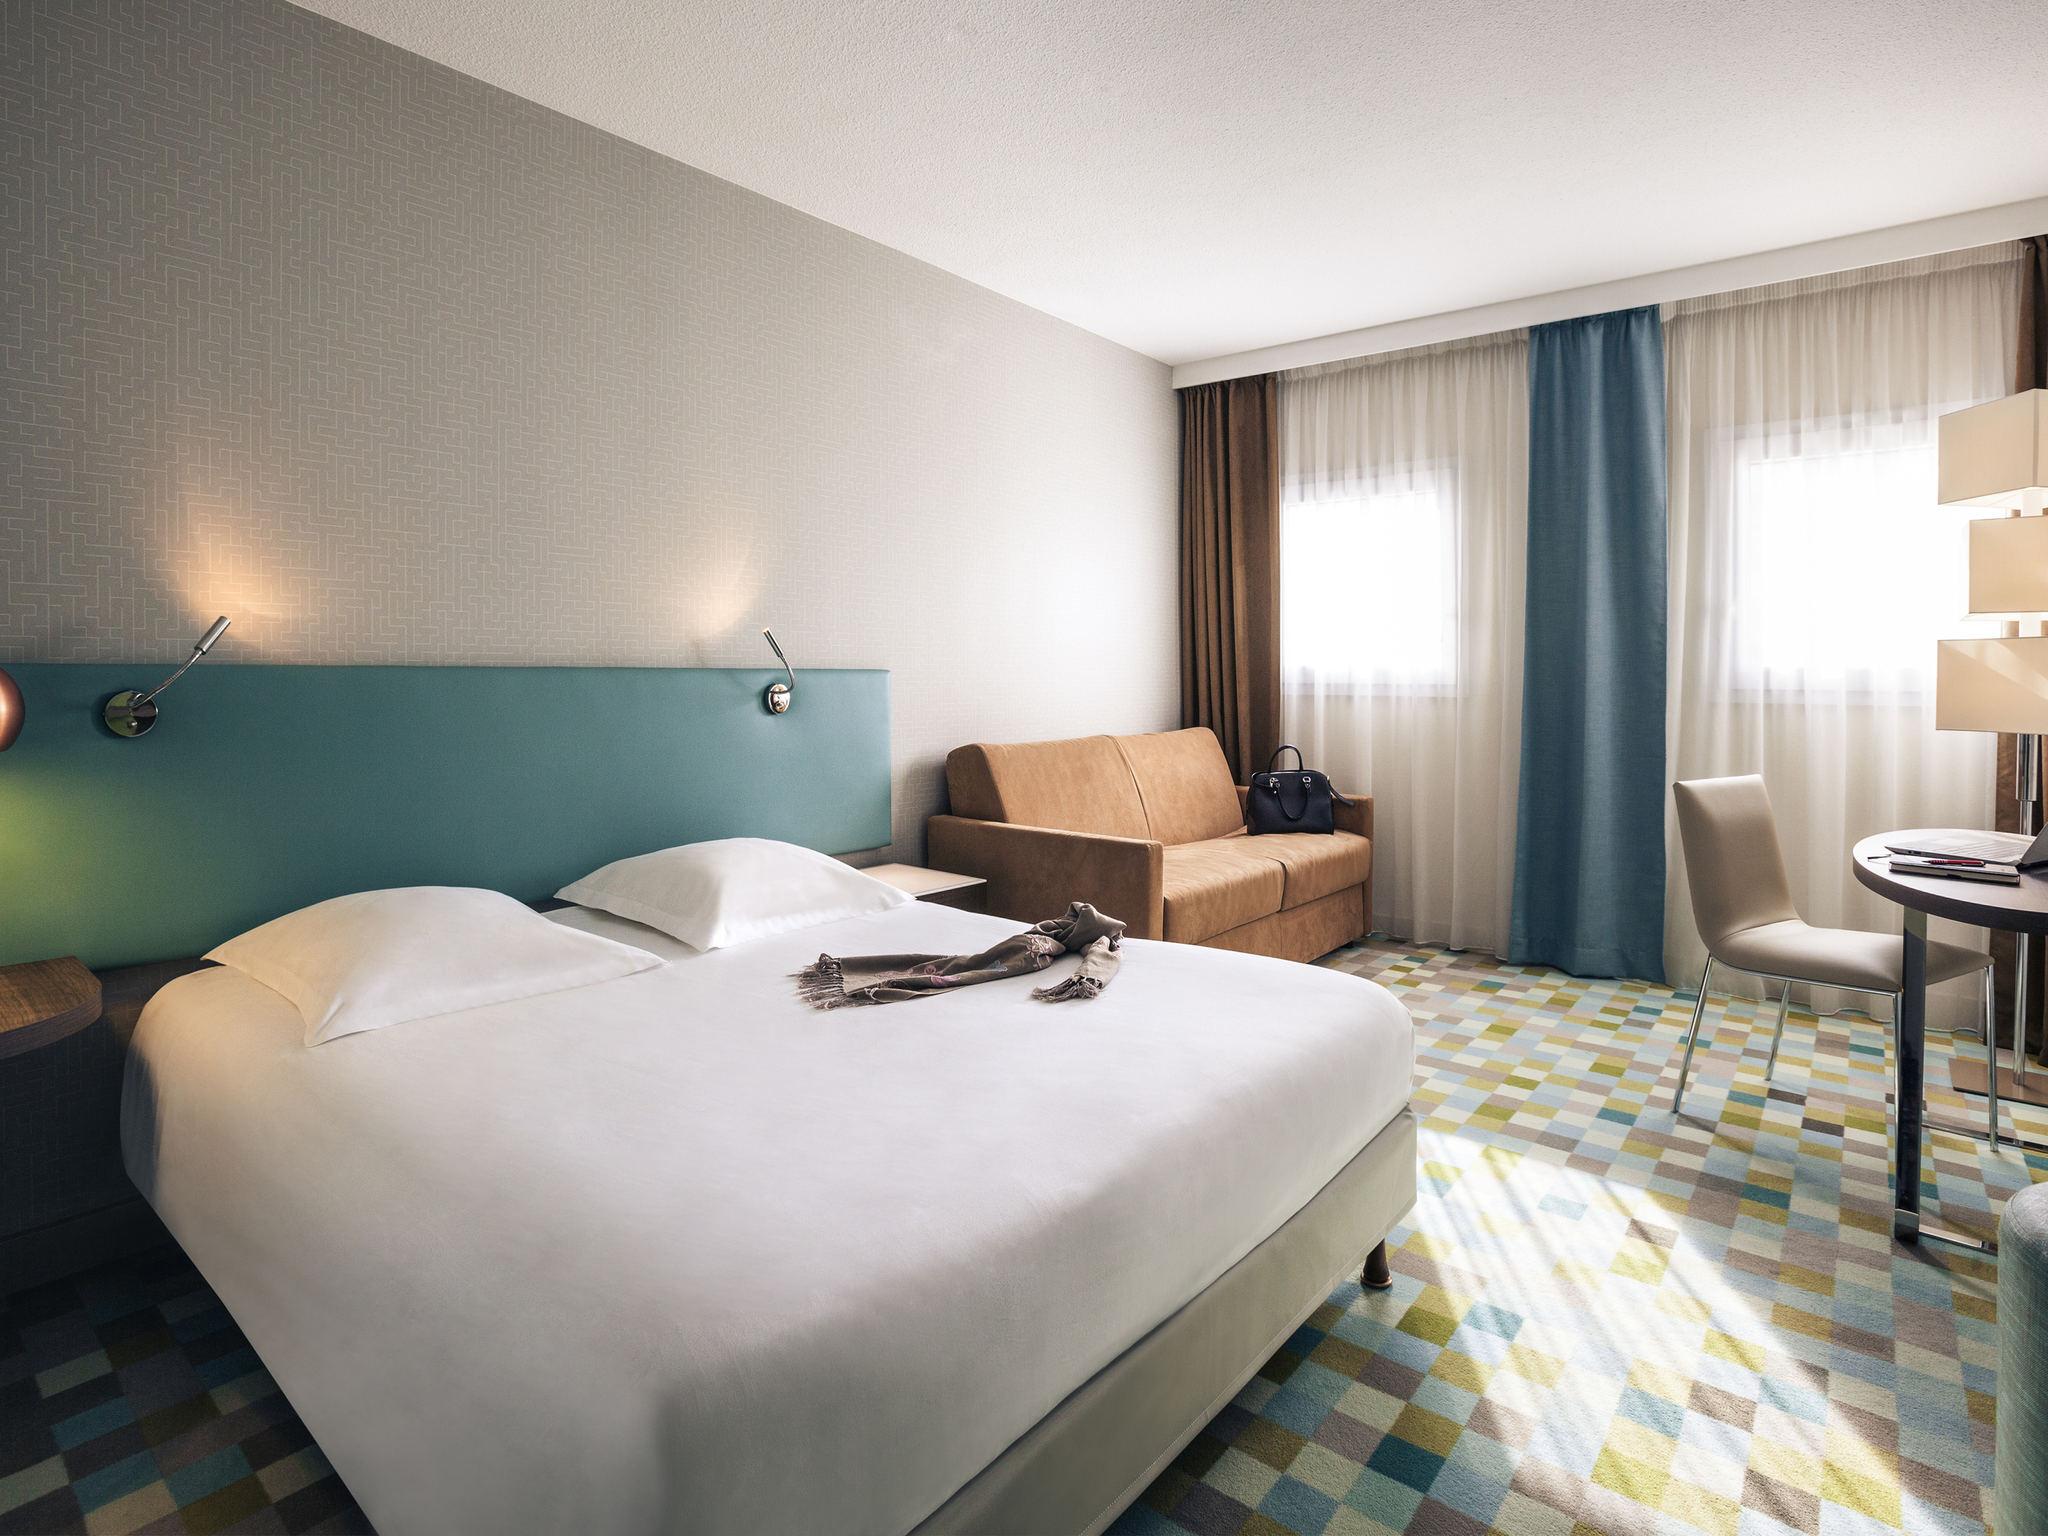 Hotel – Hôtel Mercure Marne la vallée Bussy St Georges